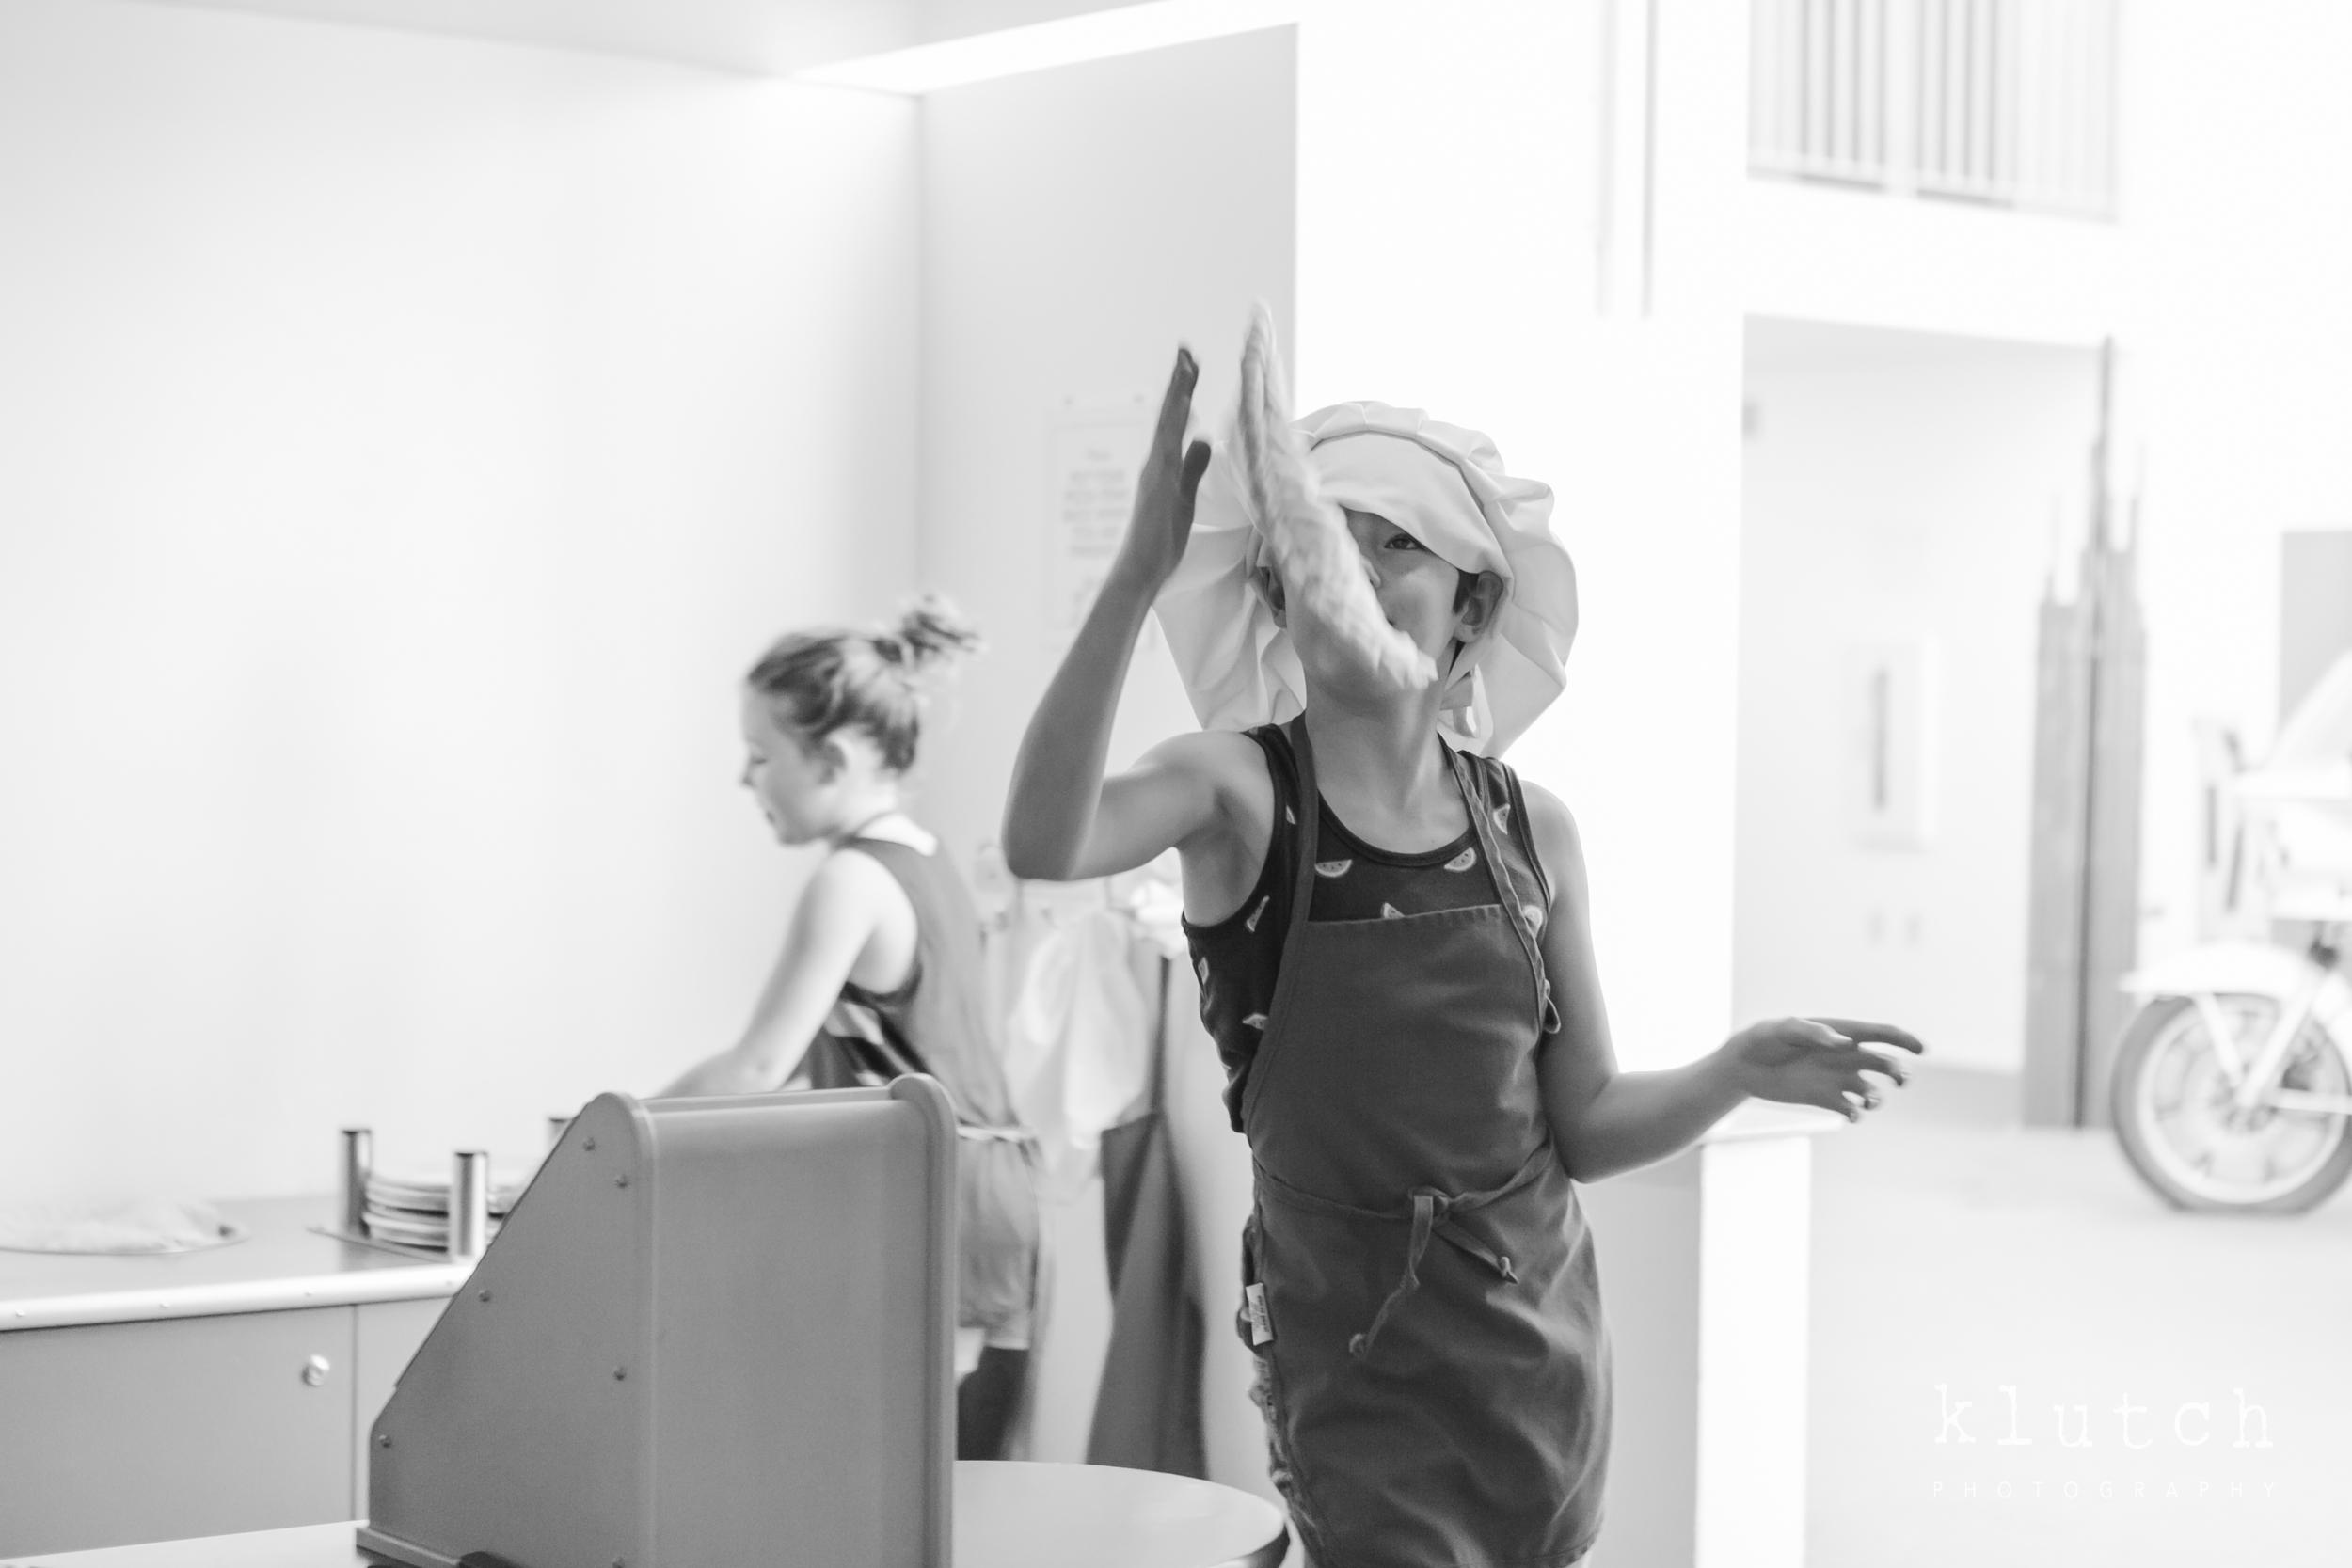 Klutch Photography,white rock family photographer, vancouver family photographer, whiterock lifestyle photographer, life unscripted photographer, life unscripted session, photography,Dina Ferreira Stoddard-15.jpg